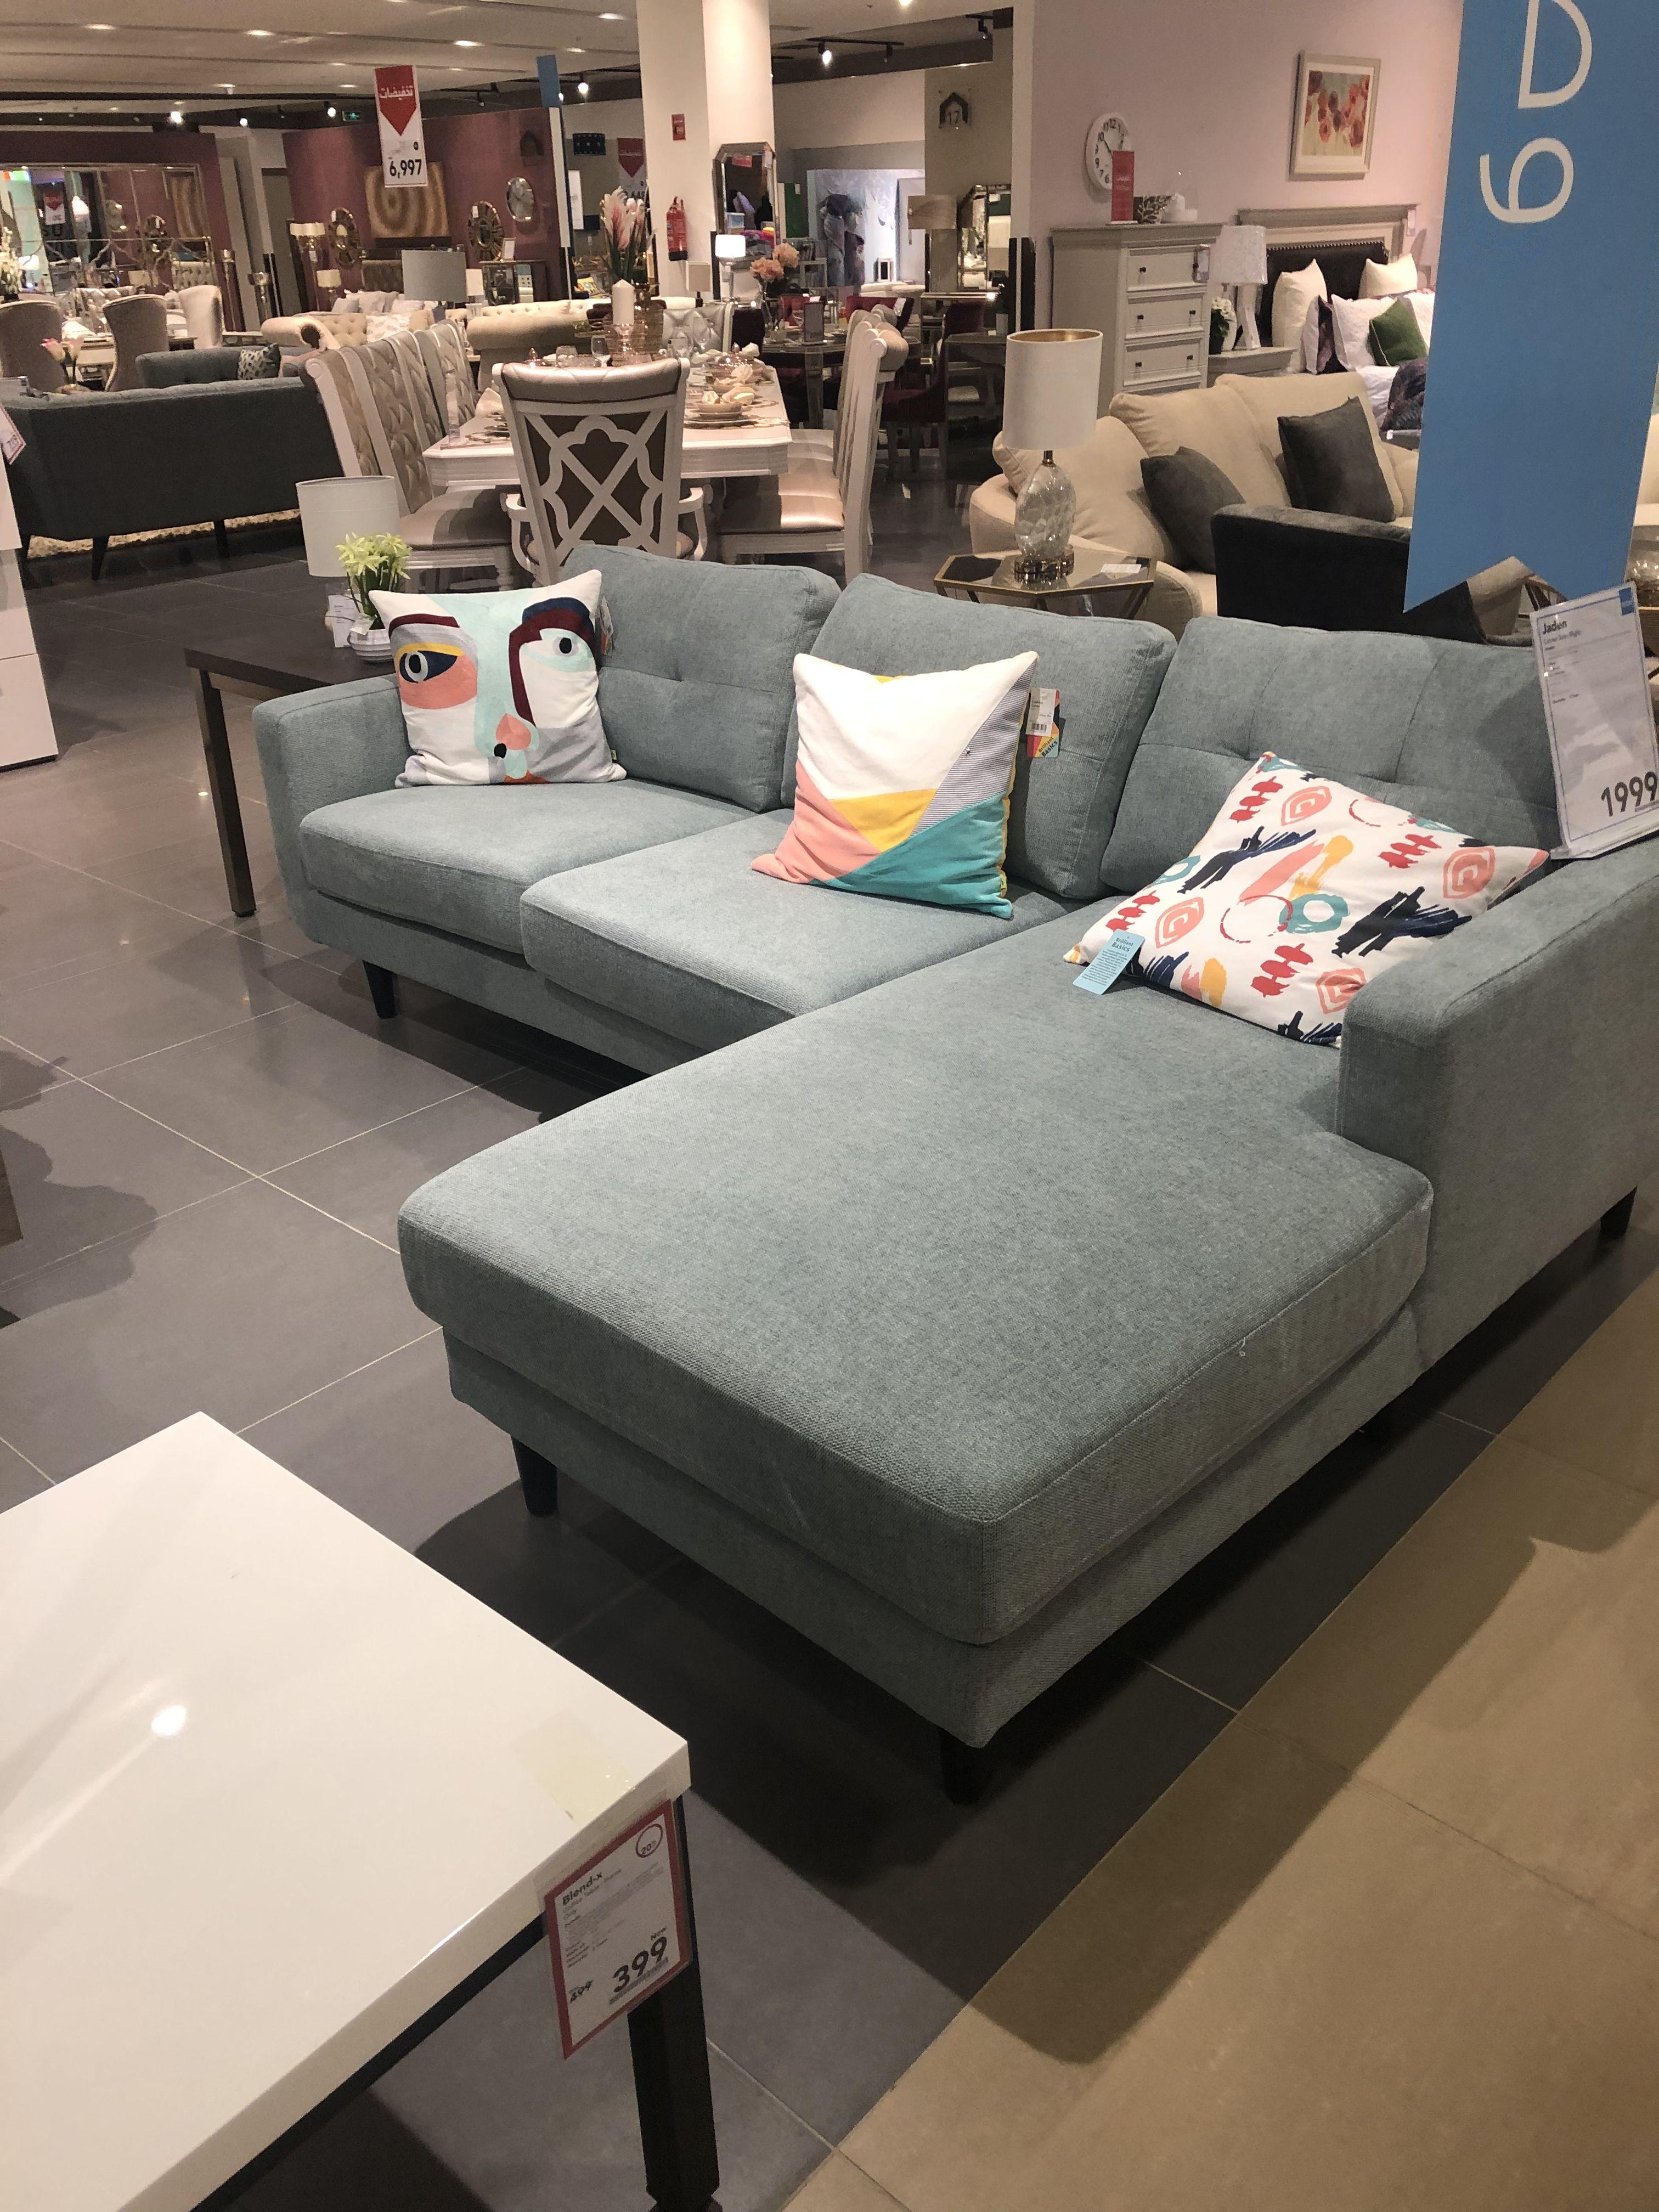 American Modern Sofa Made In Saudi Arabia كنب صوفا أمريكية حديثة مودرن على شكل حرف L مصنوعة في المملكة العربية السعودية Sectional Couch Home Decor Couch